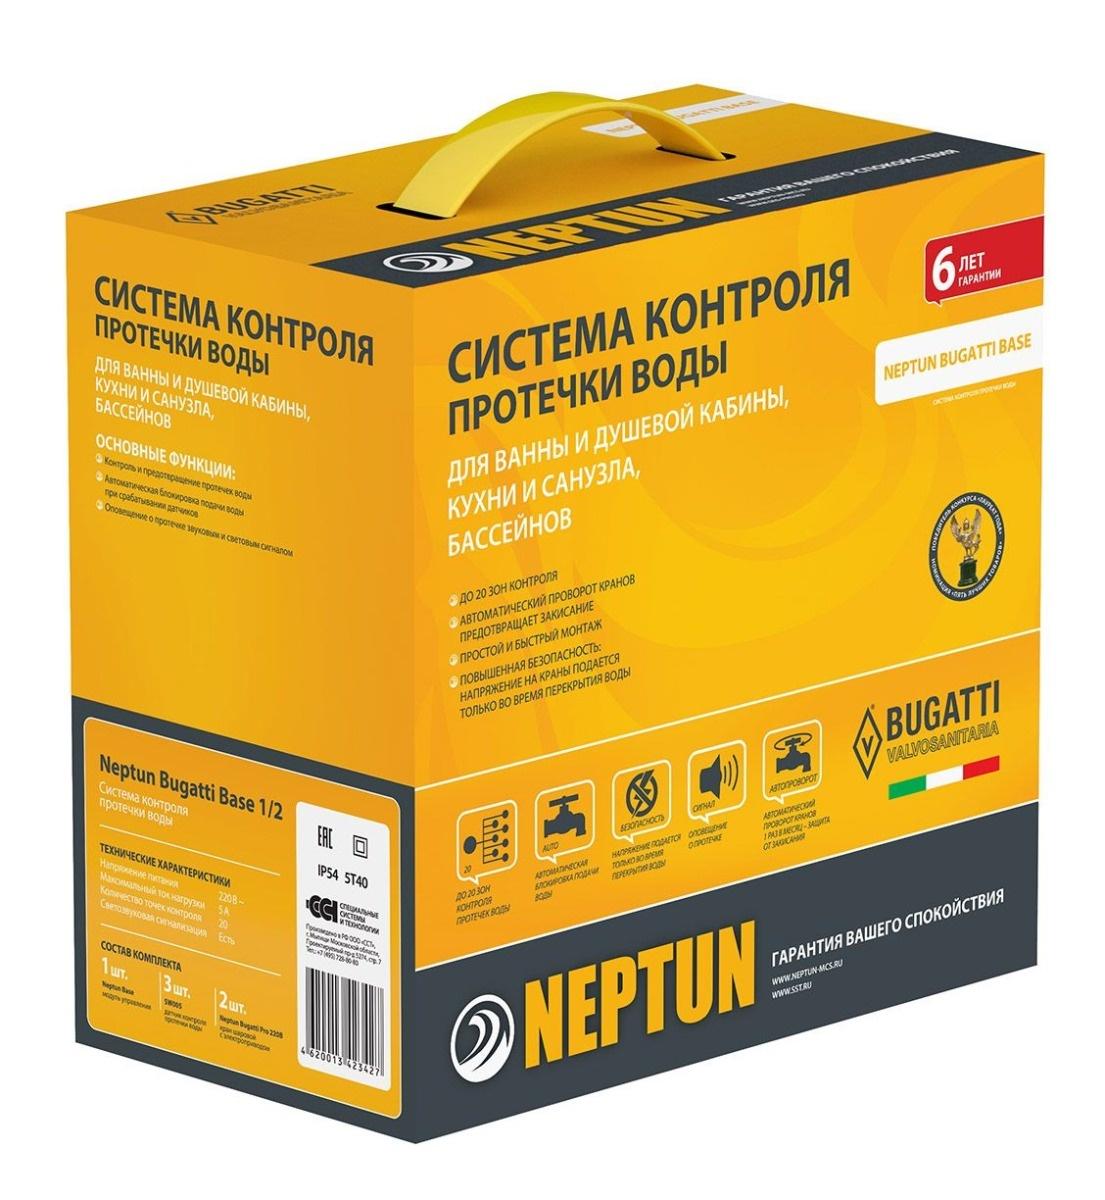 Neptun Bugatti Base 1/2 Система защиты от протечек воды